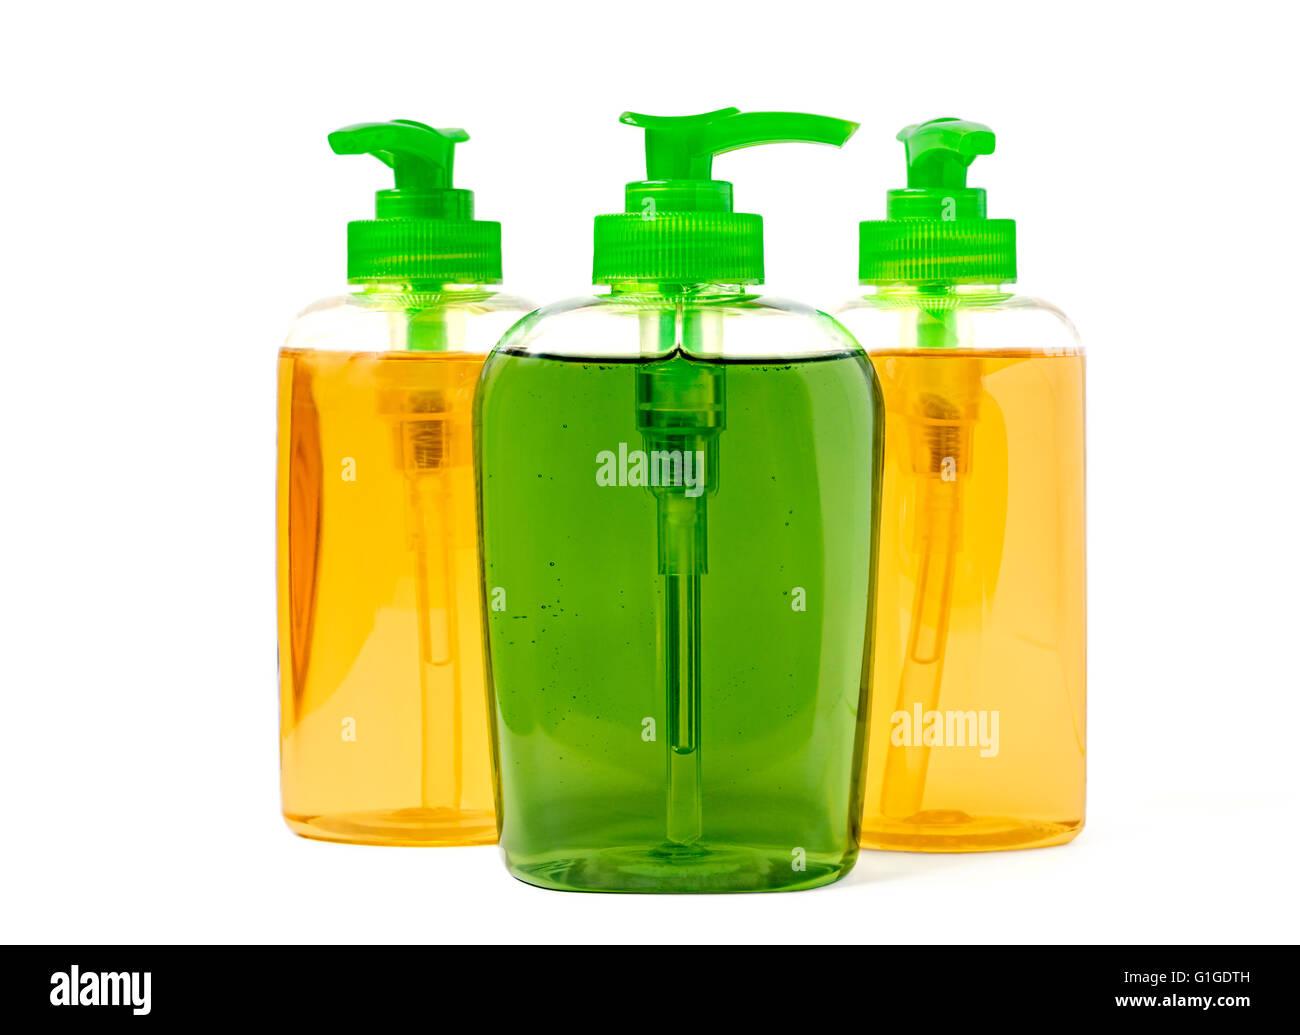 Three liquid soap dispenser plastic bottles isolated on white - Stock Image